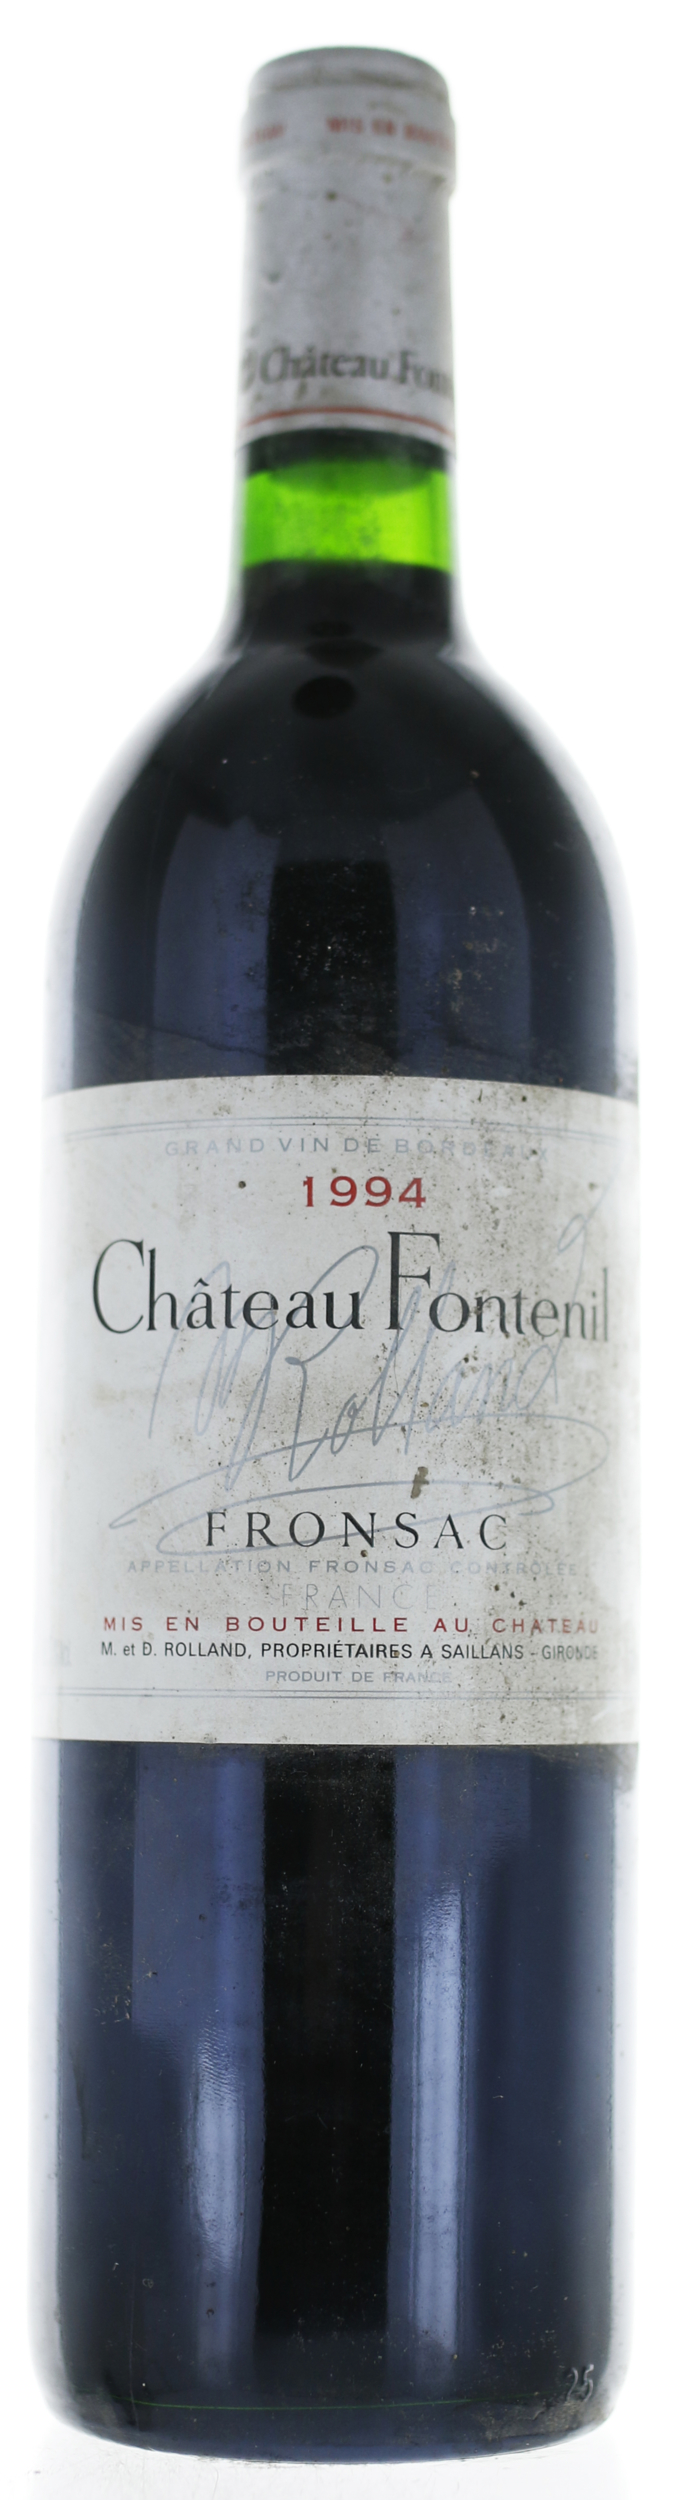 Fronsac - Fontenil - 1994